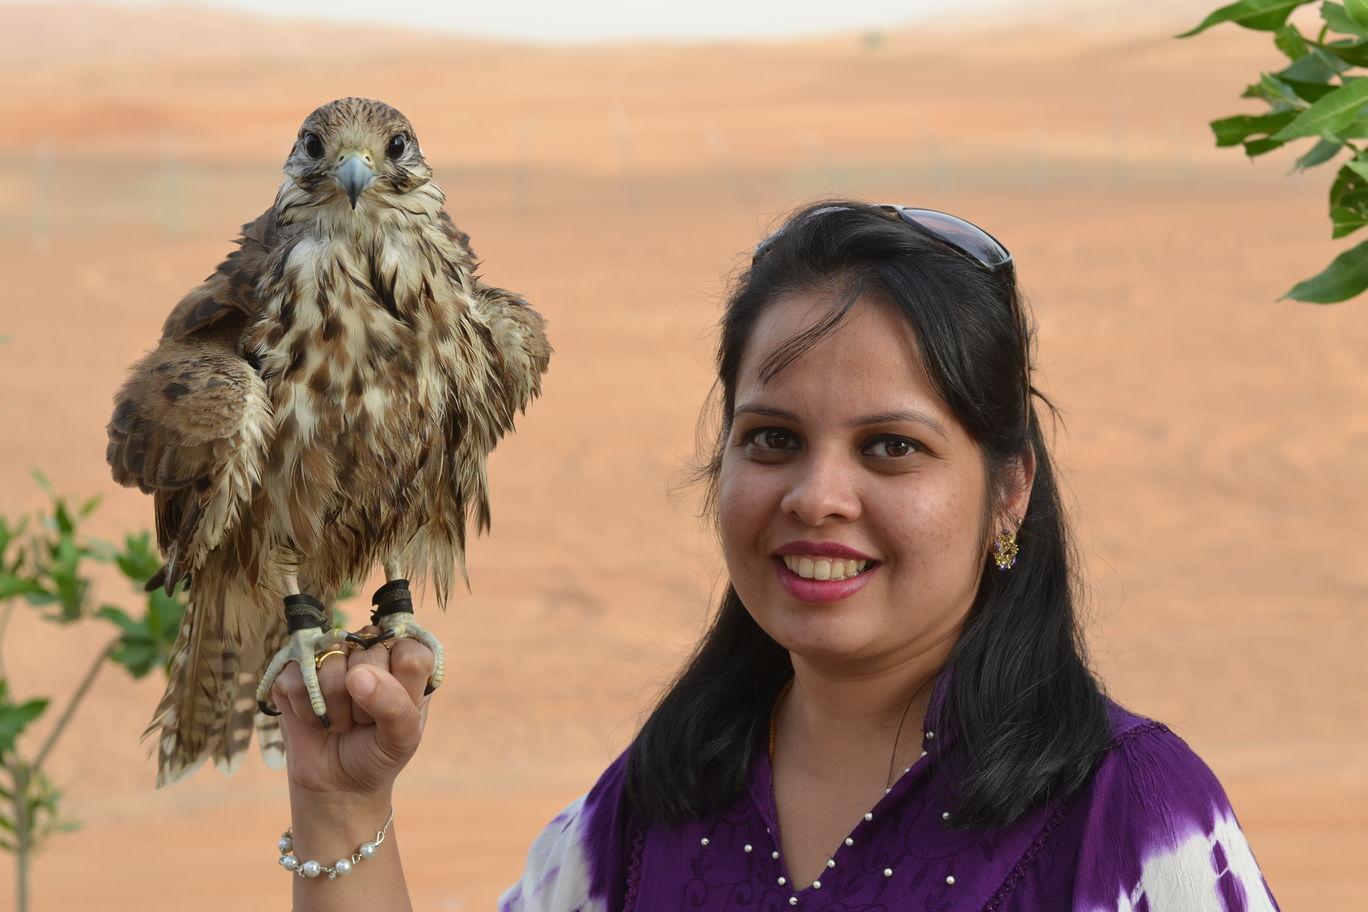 Photo of Desert Safari Dubai By Karthik Gandhi aka GastroHogger